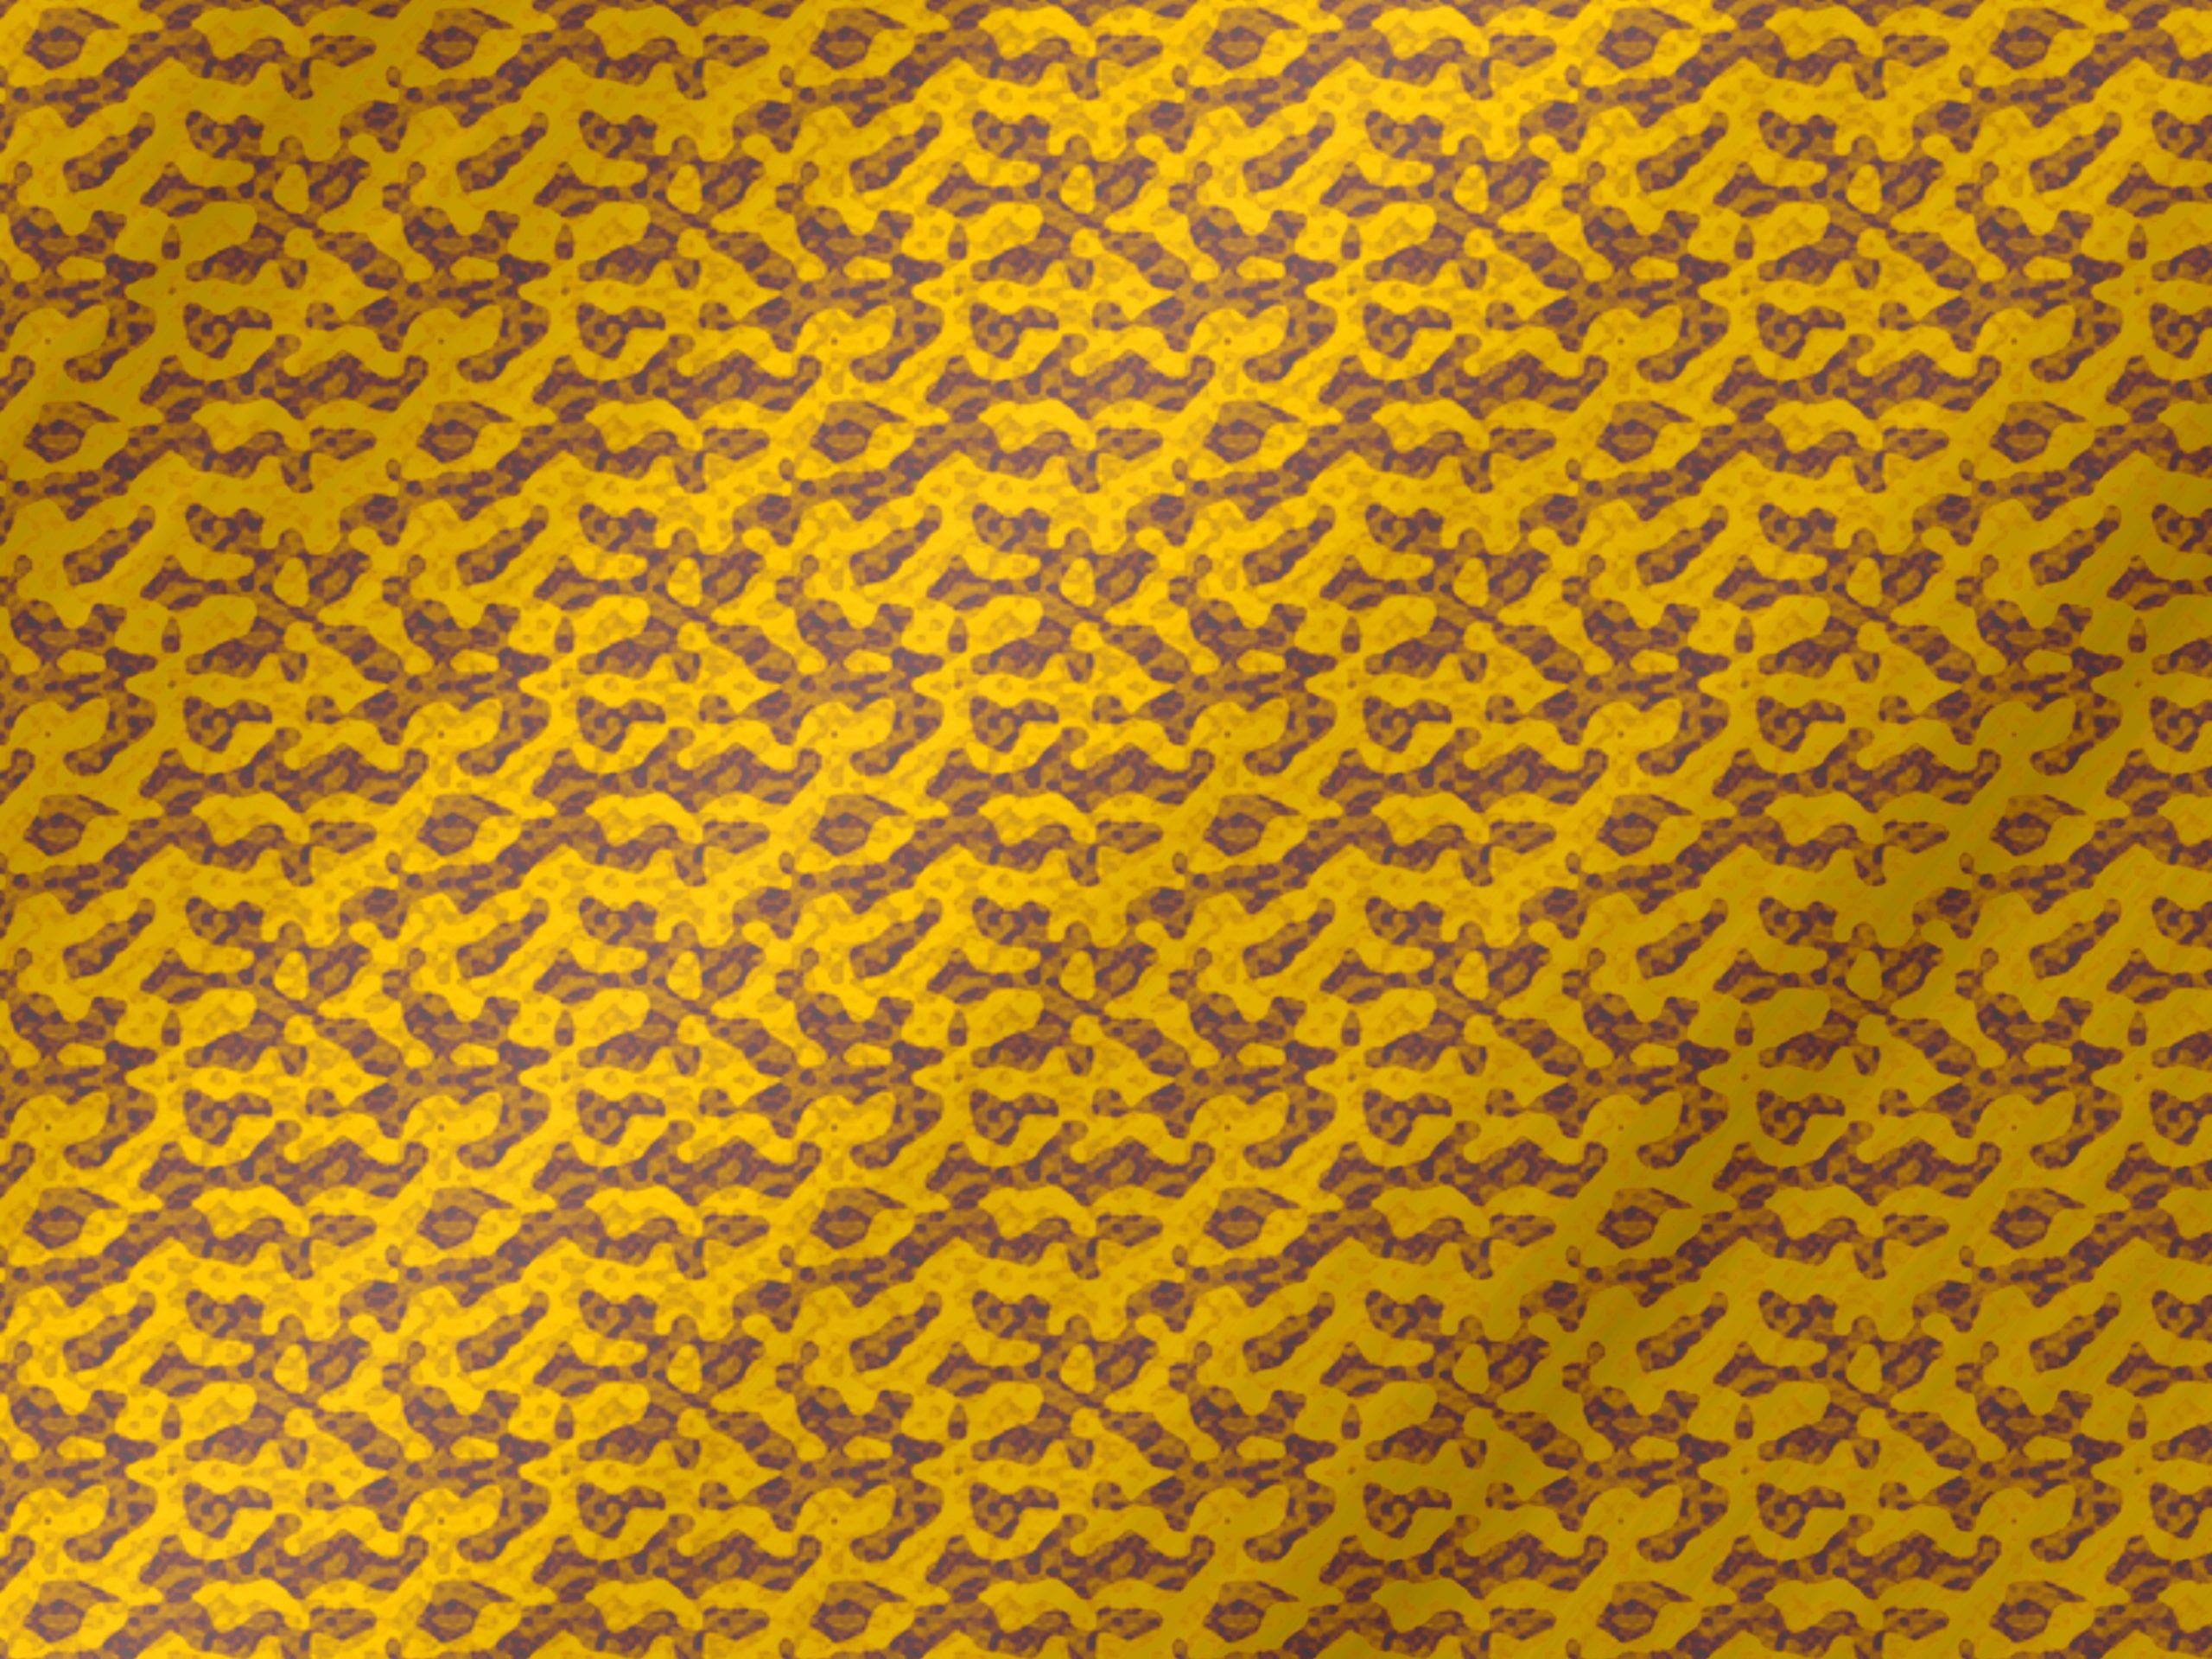 Yellow color pattern illustration